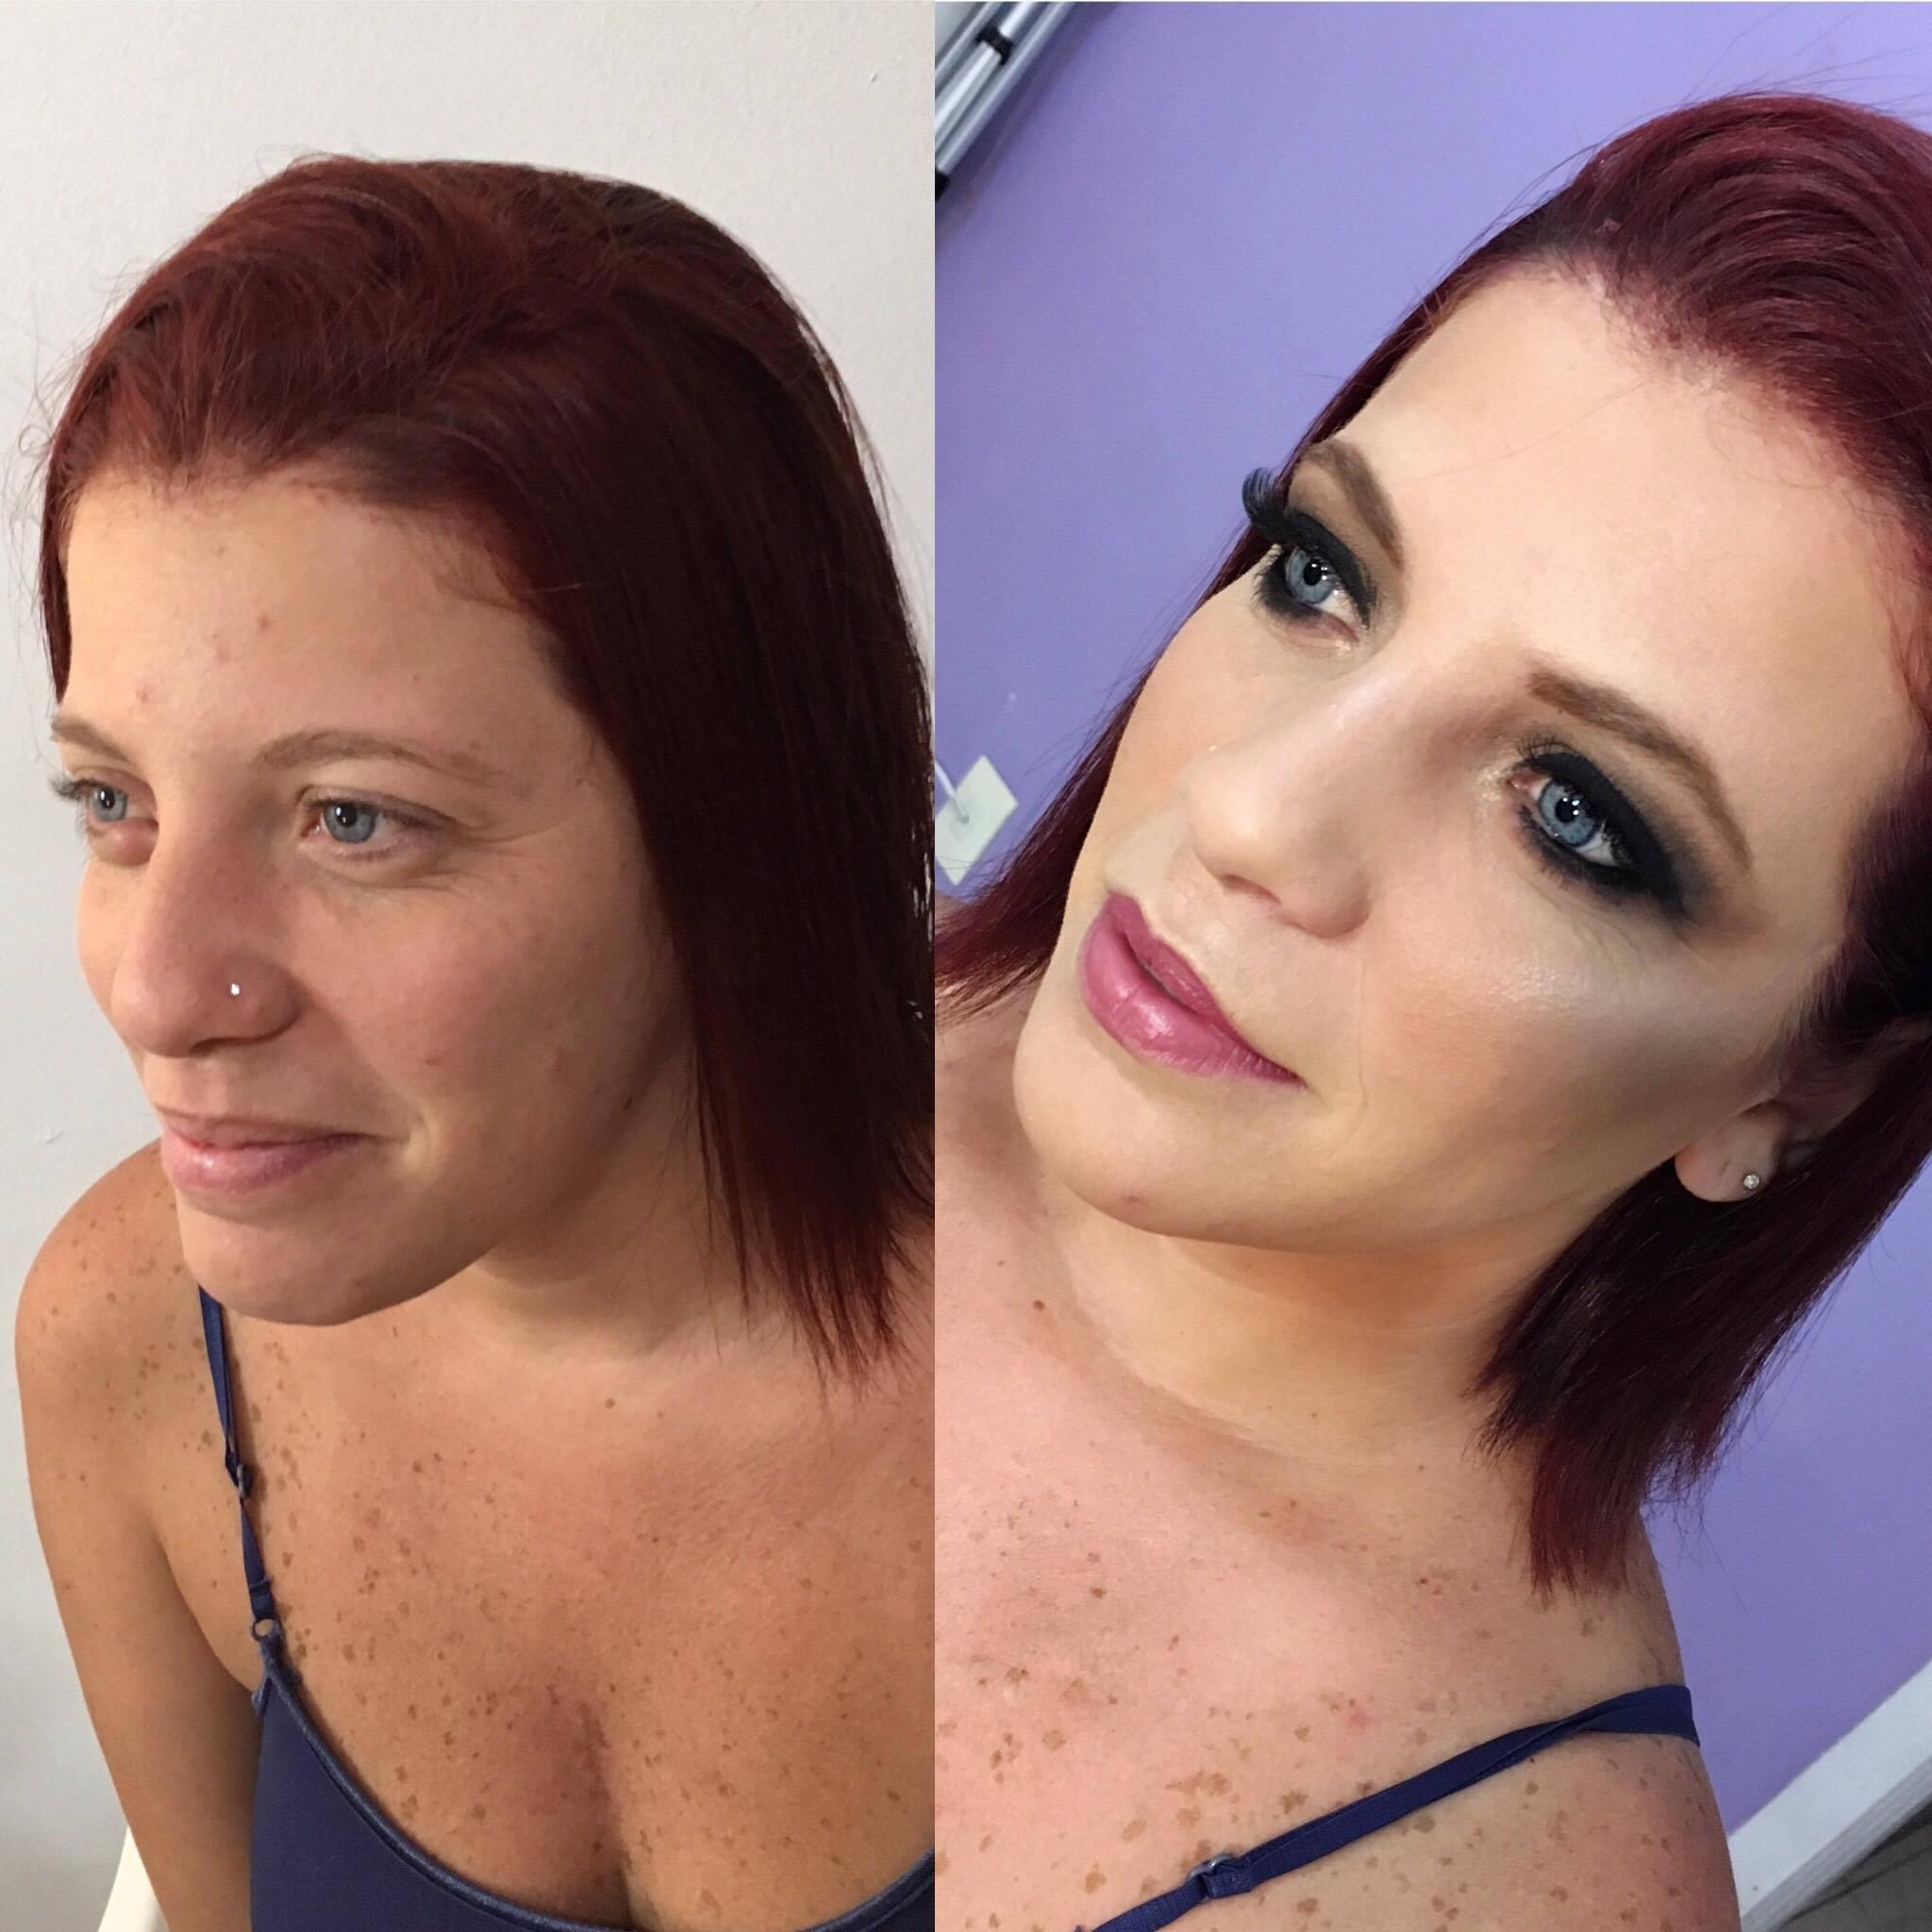 #maquiagem #makeup #beauty #universodamaquiagem #inspiracao #mac #maccosmetics #rj #riodejaneiro #sephora #maquillage #job #makeuplovers #makepro #universomakeup #ouniversodasnoivas #bride #loucaspormaquiagem #anastasiabeverlyhills #lashes #kyliejenner #fashion #insta_makeup maquiagem maquiador(a)